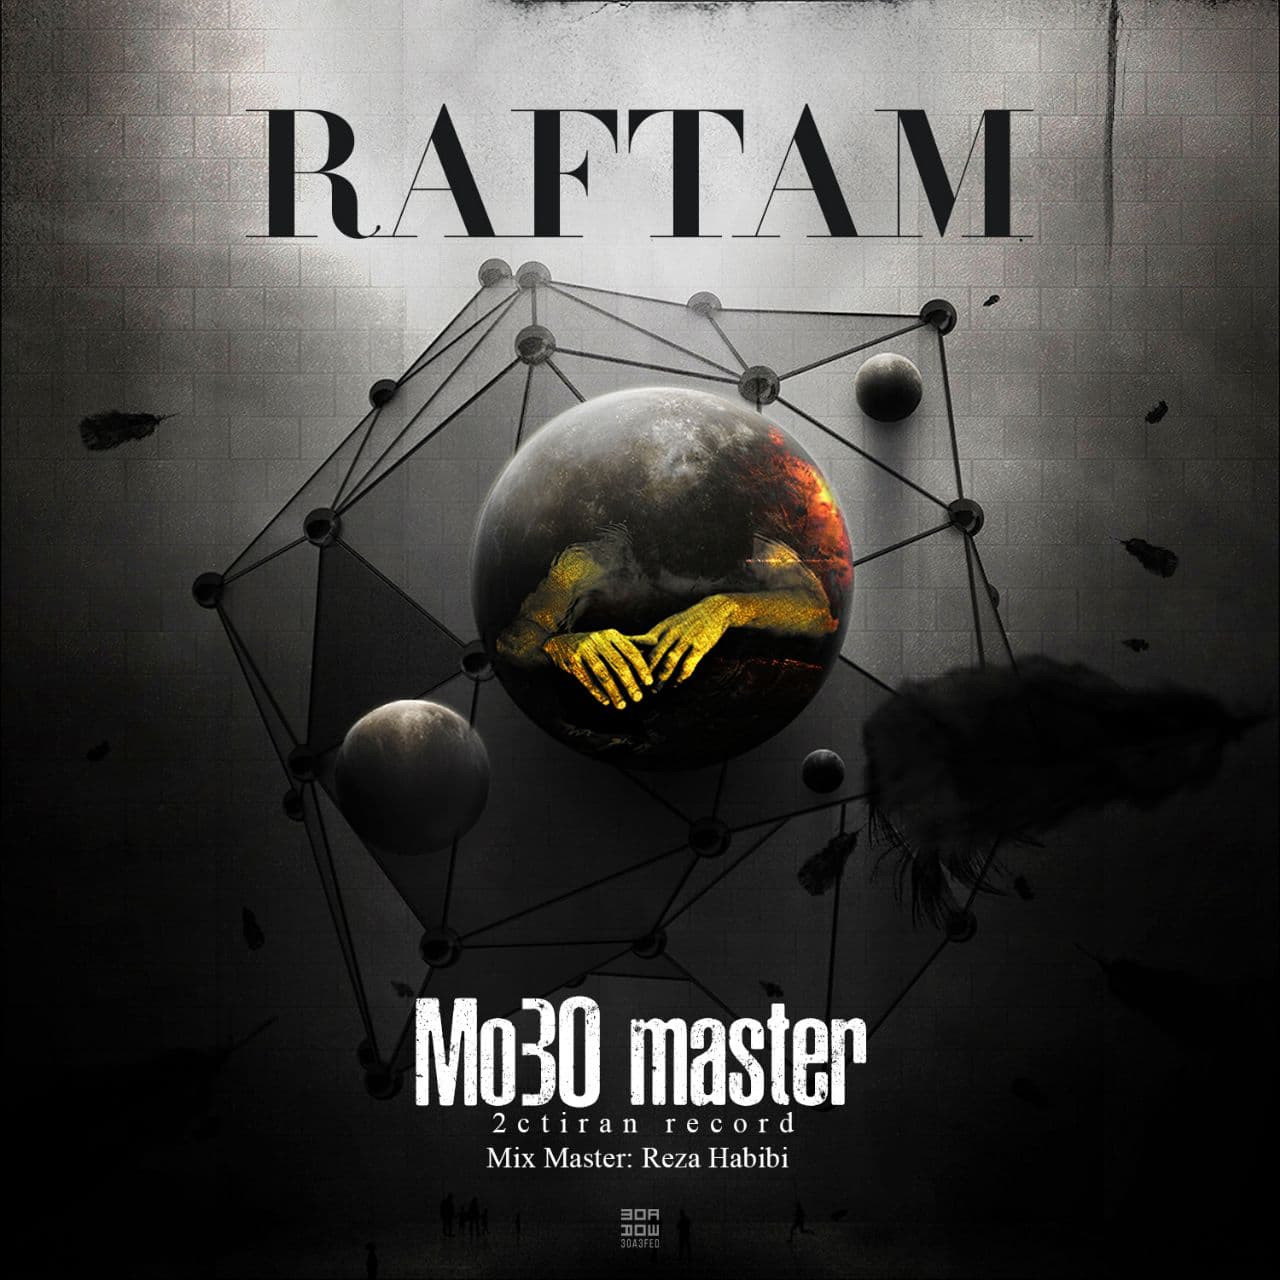 Mo30 Master - Raftam